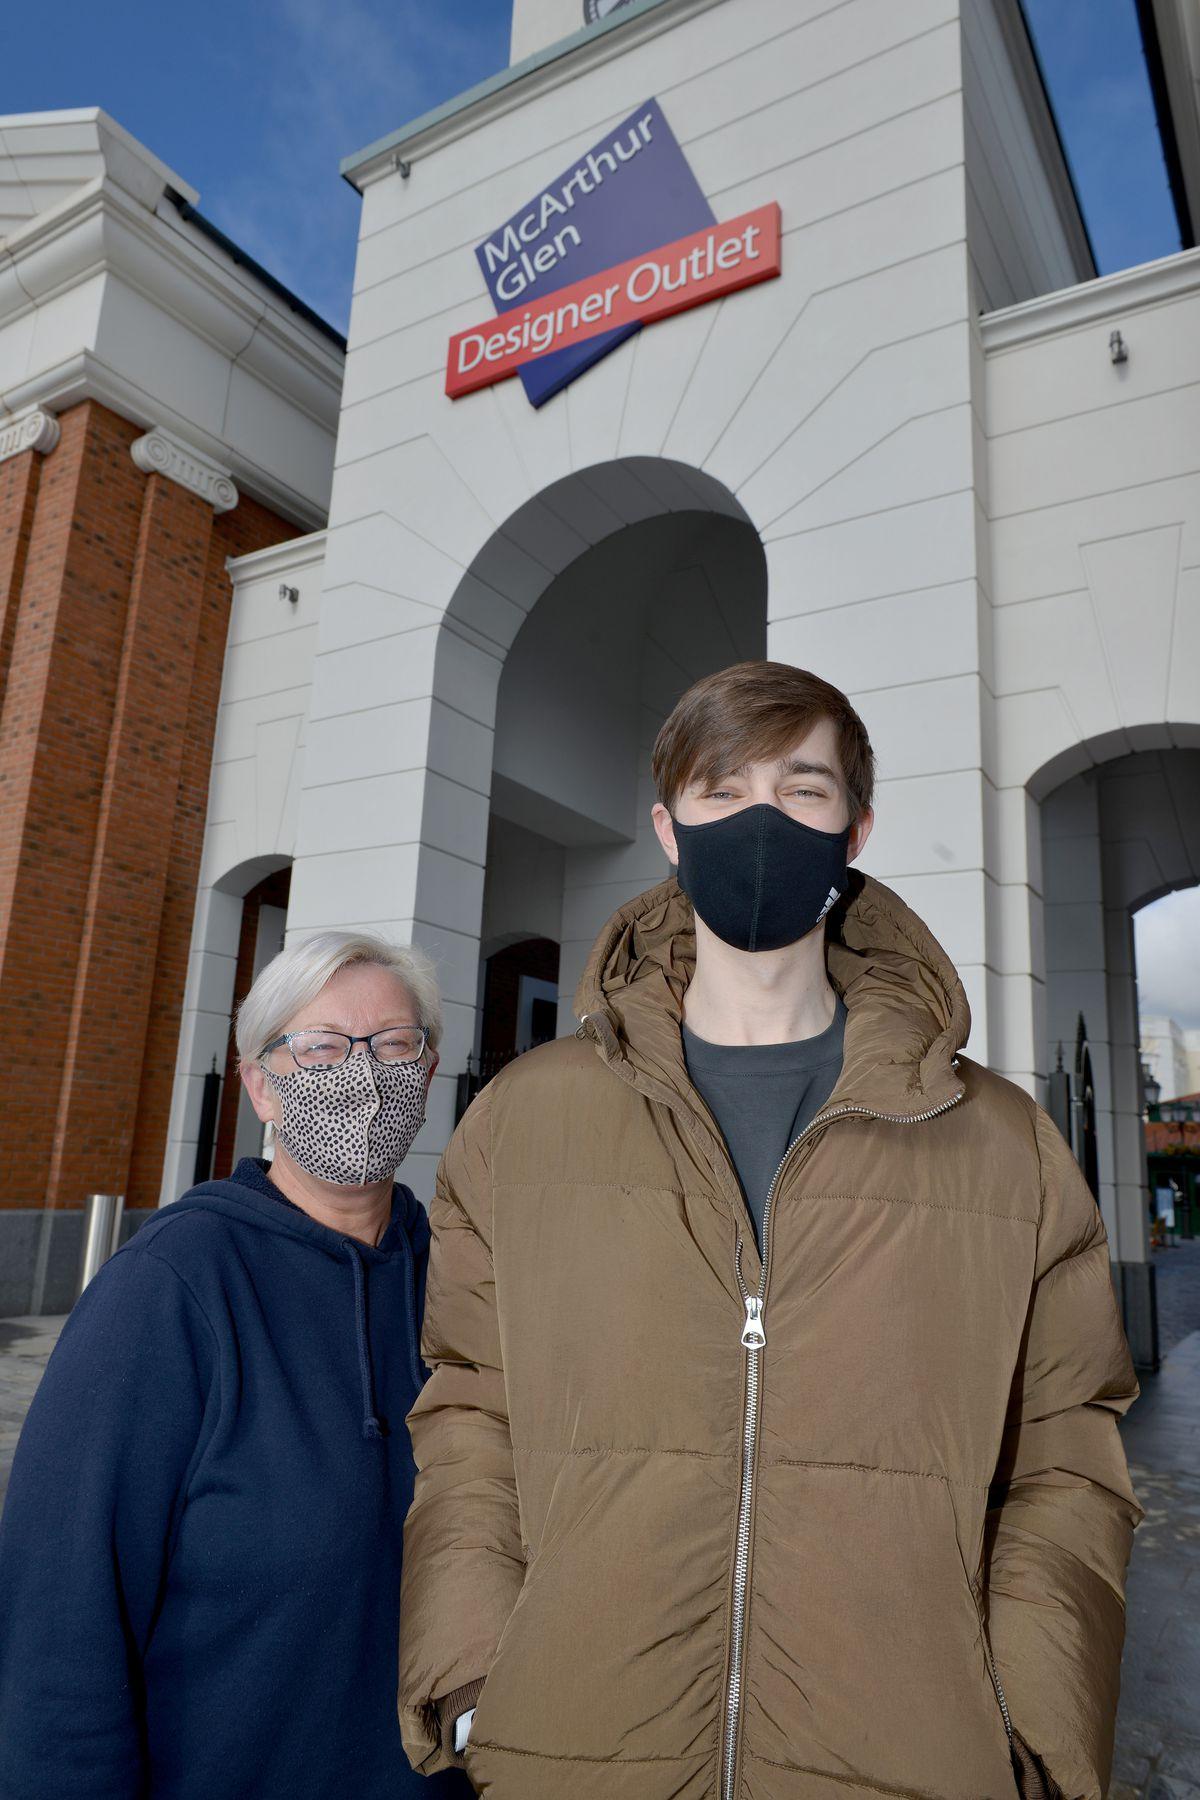 Joanne Williams and her son Sam Probert